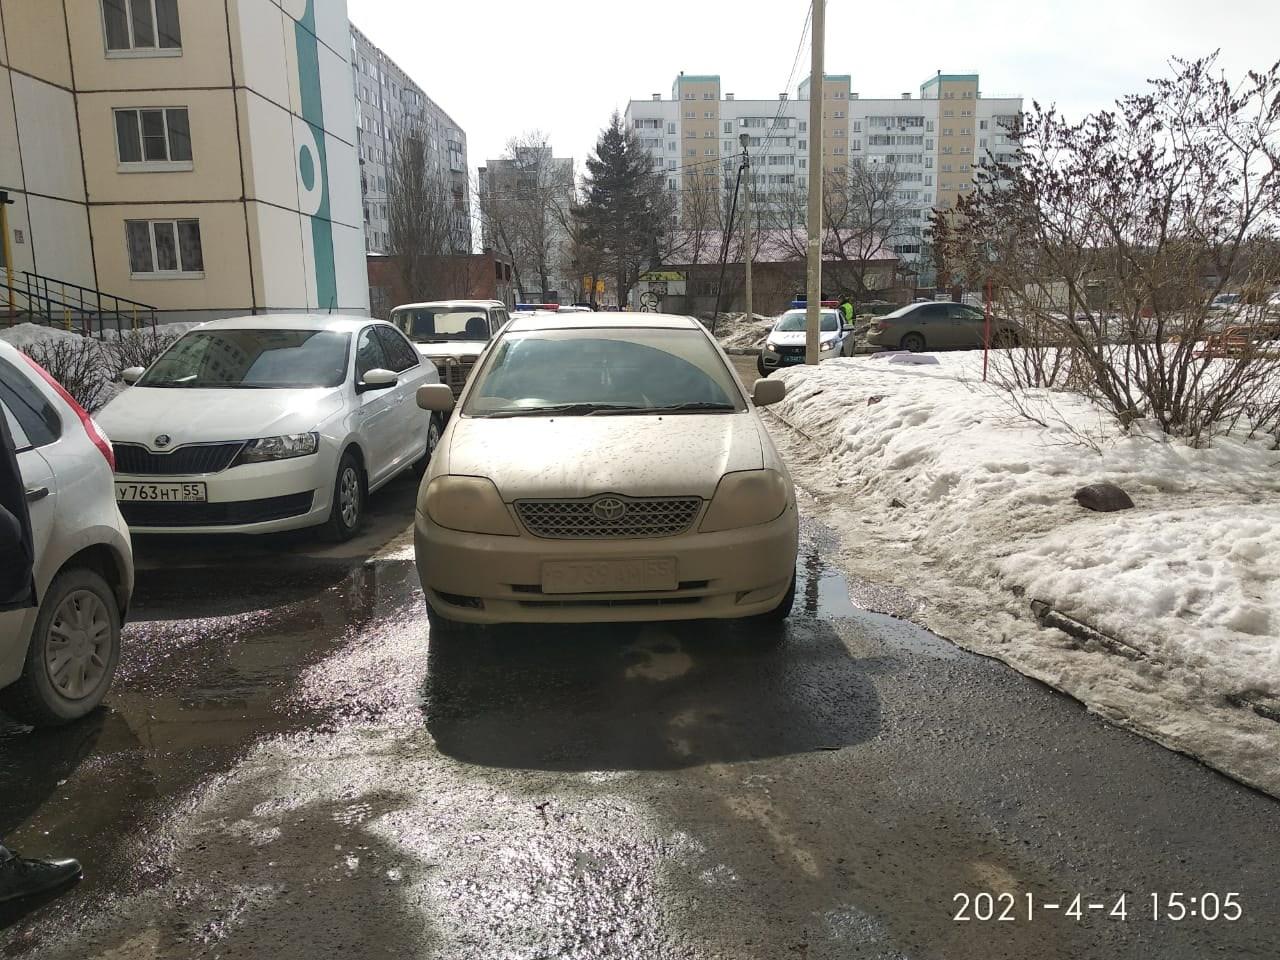 Омич на «тойоте» сбил ребенка во дворе многоэтажки #Омск #Общество #Сегодня